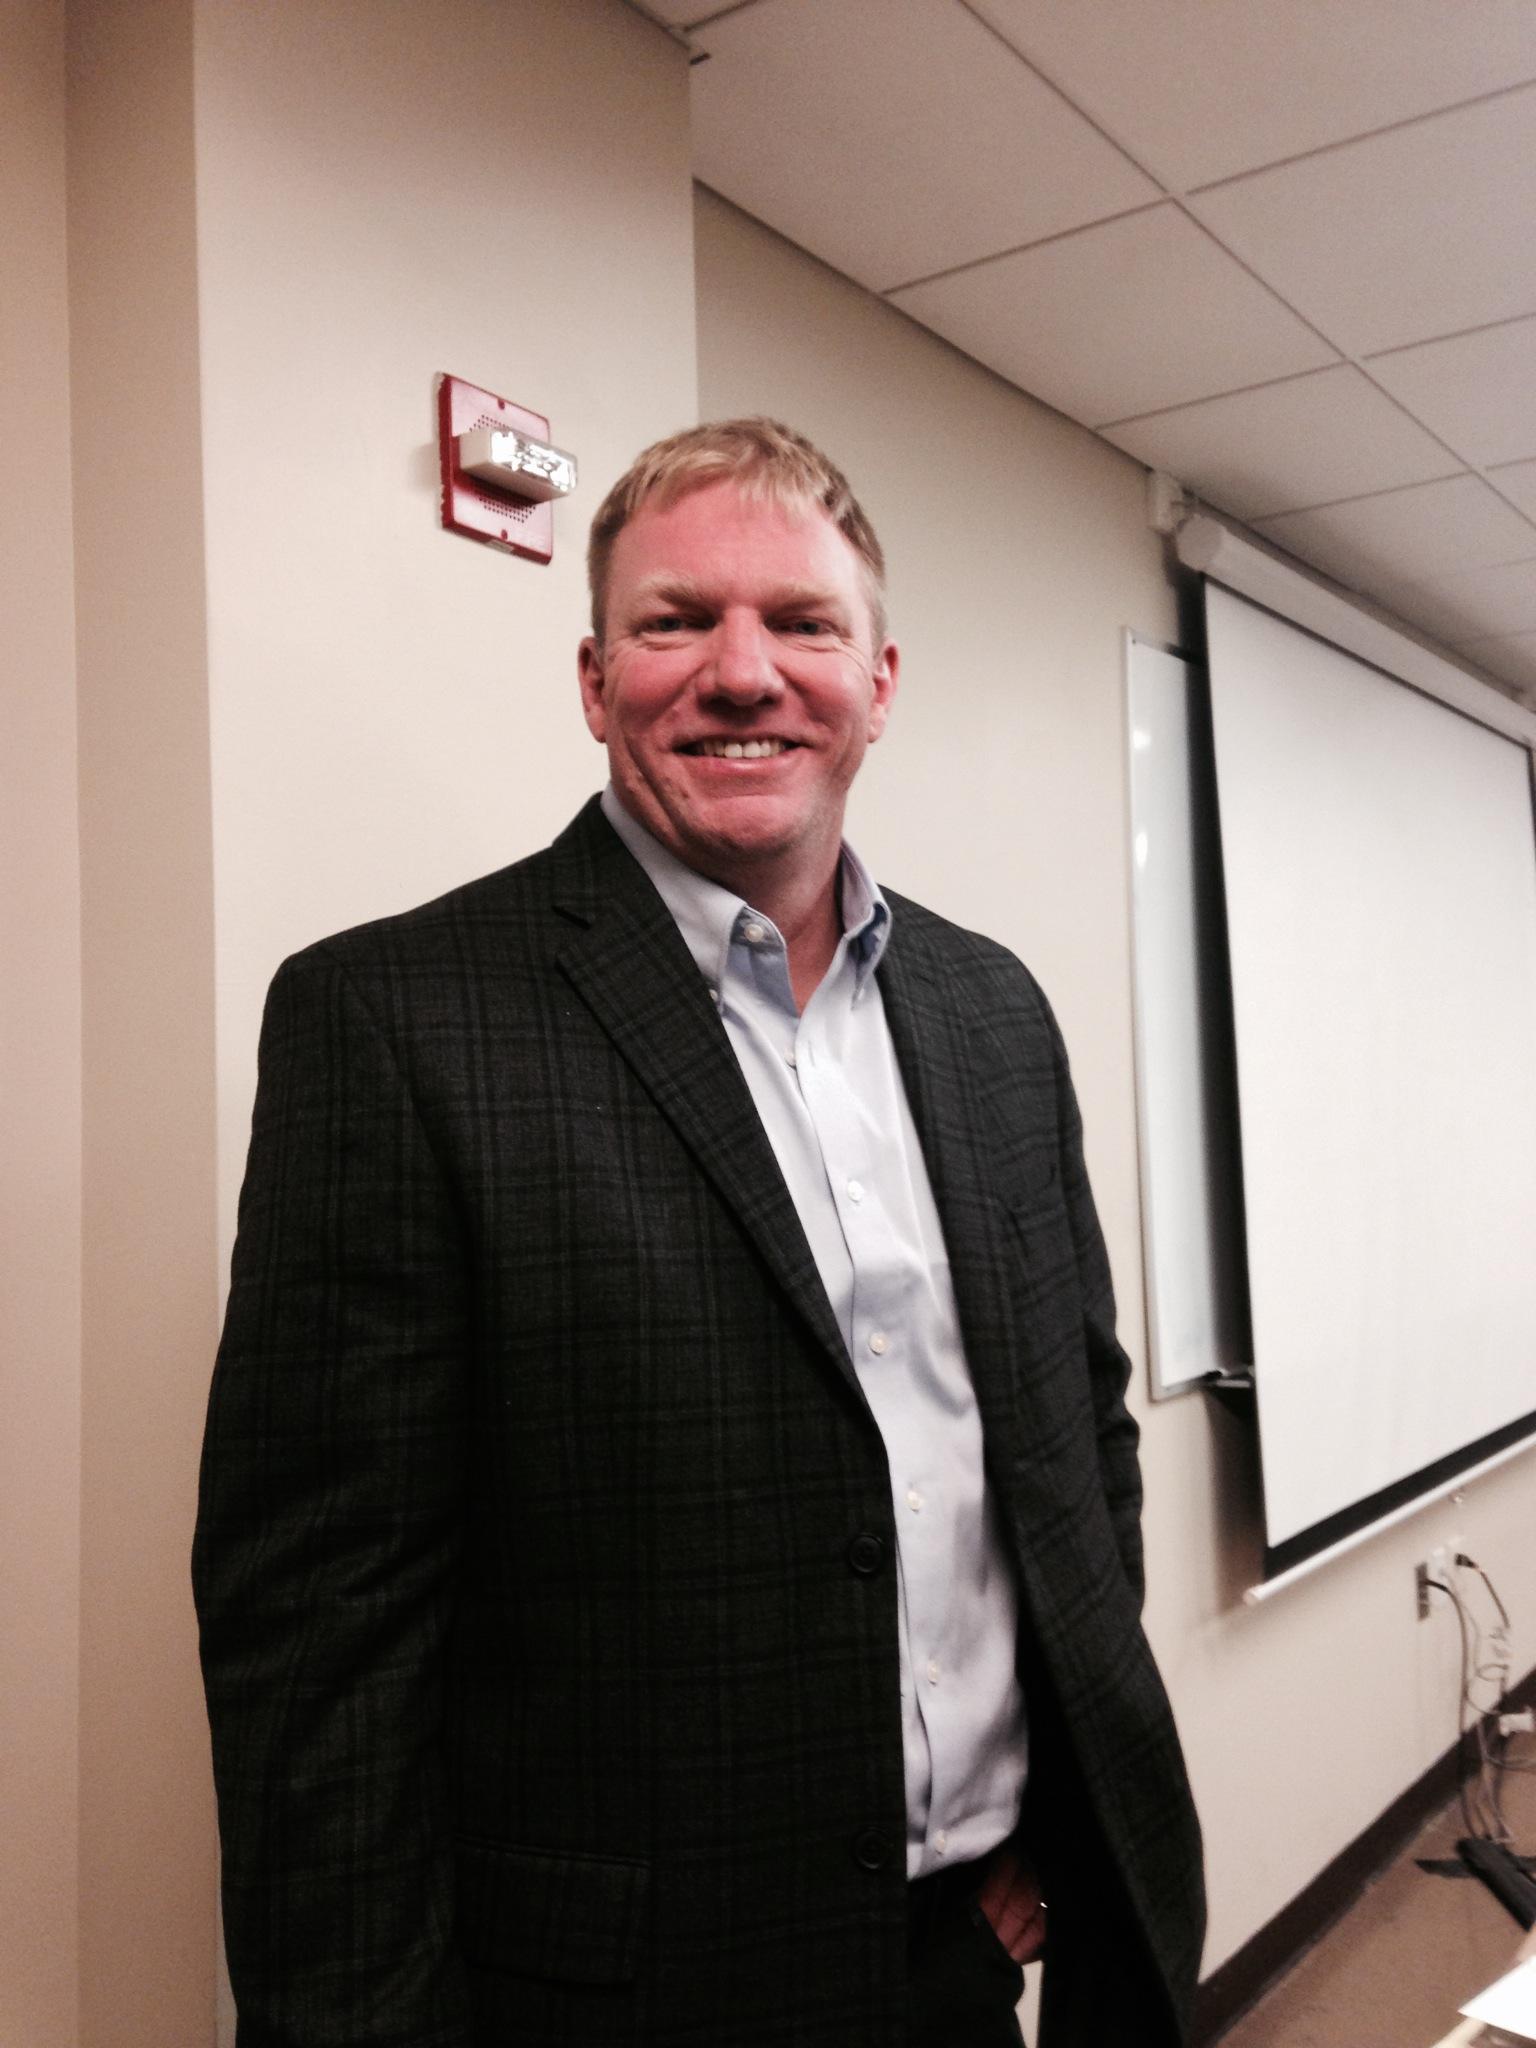 Co-executive producer Jason Jones. Photo taken by Megan Palmer.